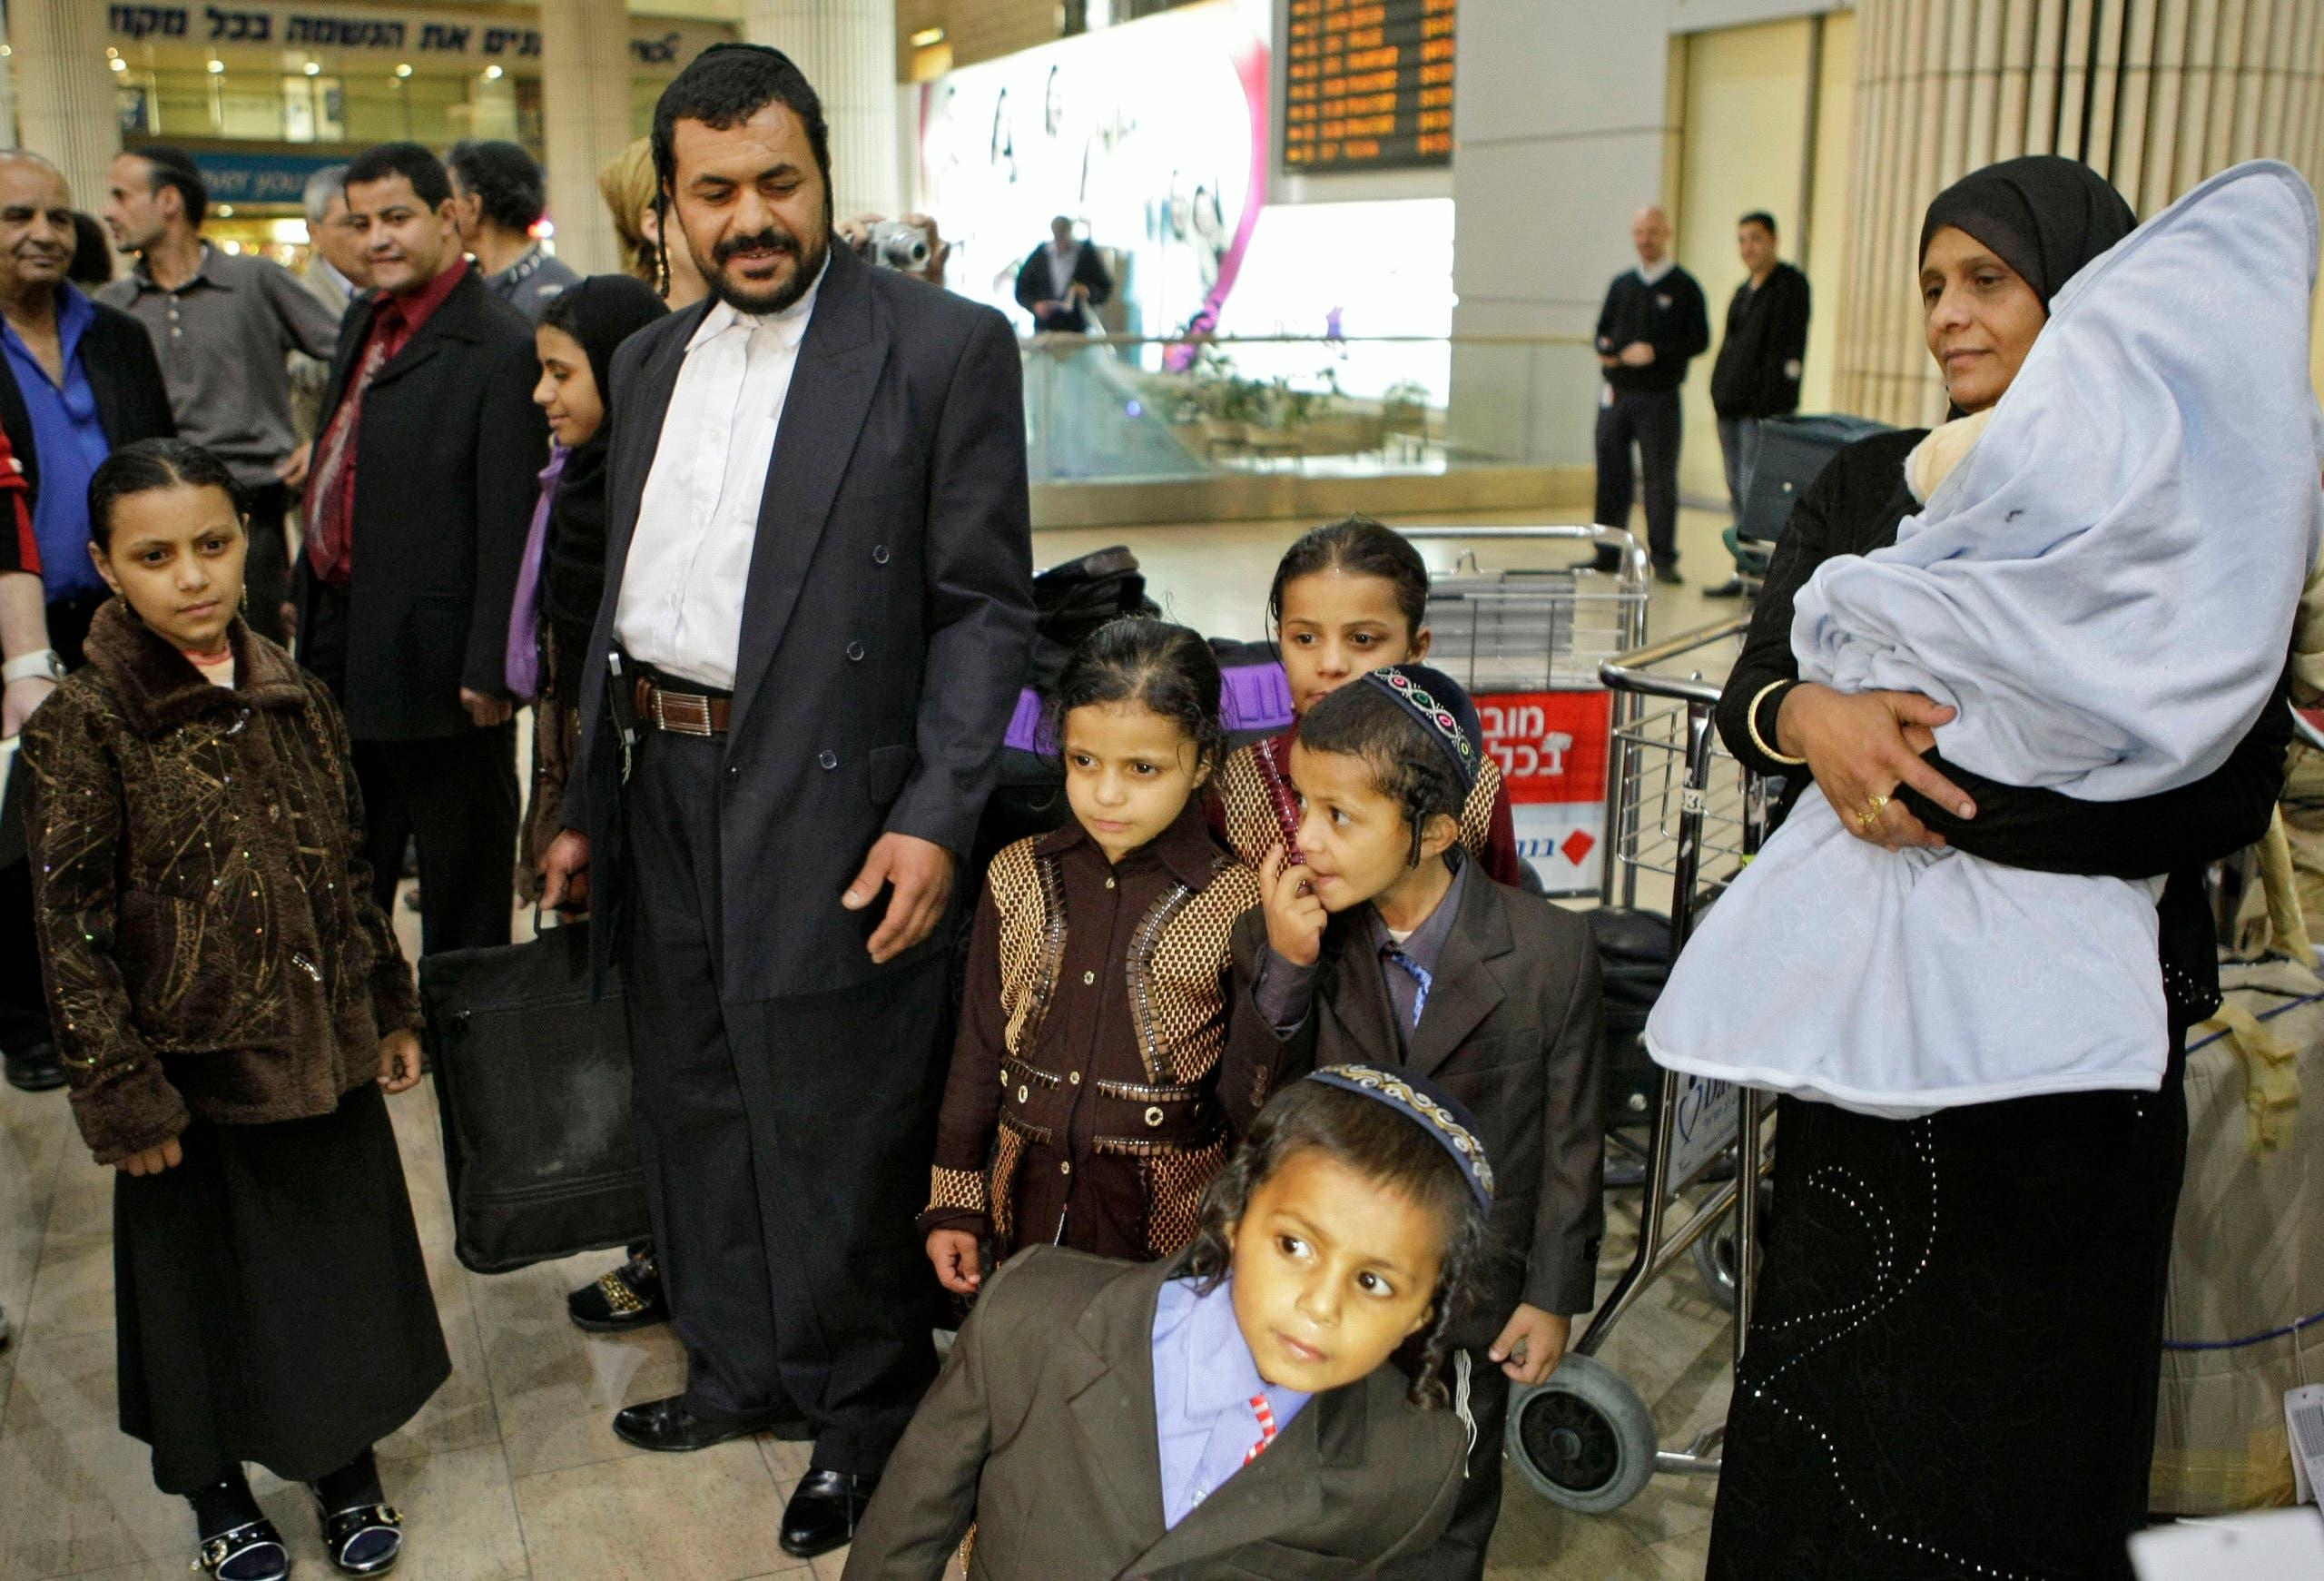 Yemenite Jews Said Ben Yisrael, second left, his wife Simha, right, and their children arrive at Ben Gurion airport near Tel Aviv, Israel, Thursday, Feb. 19, 2009. (AP)